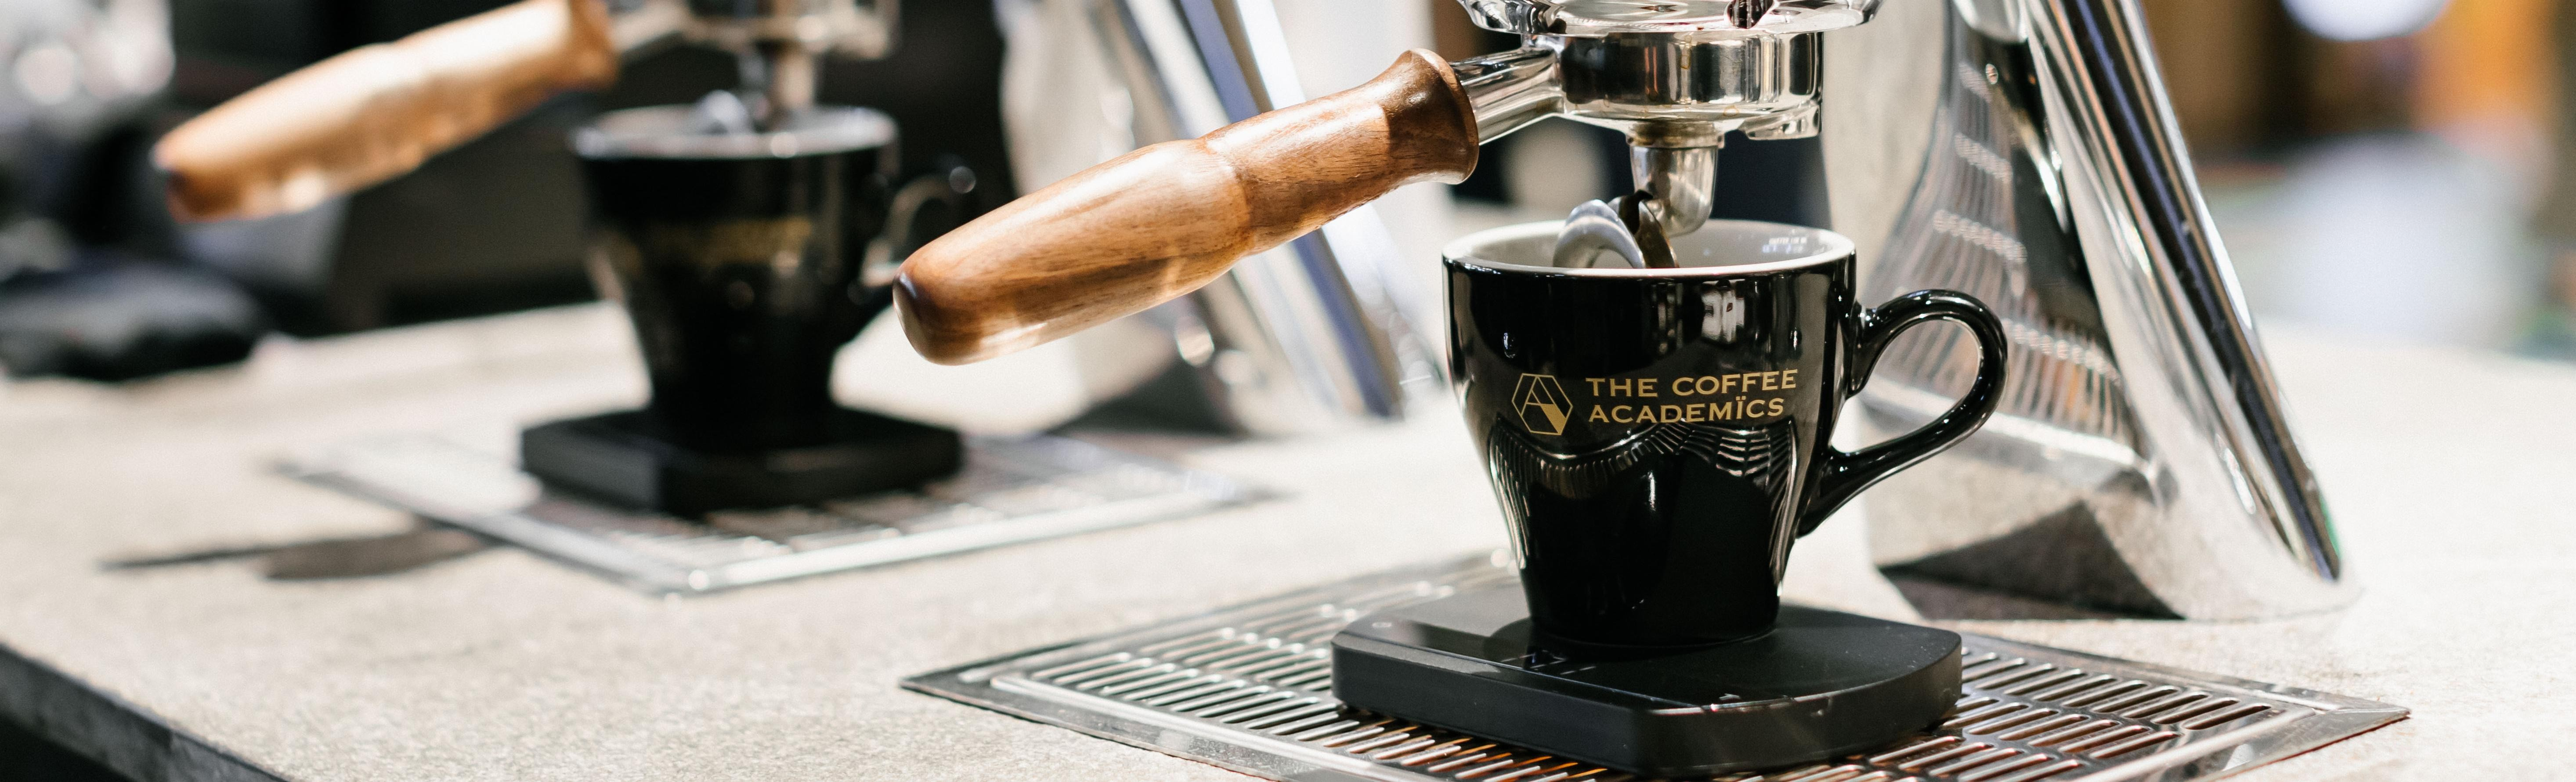 The Coffee Academics Linkedin